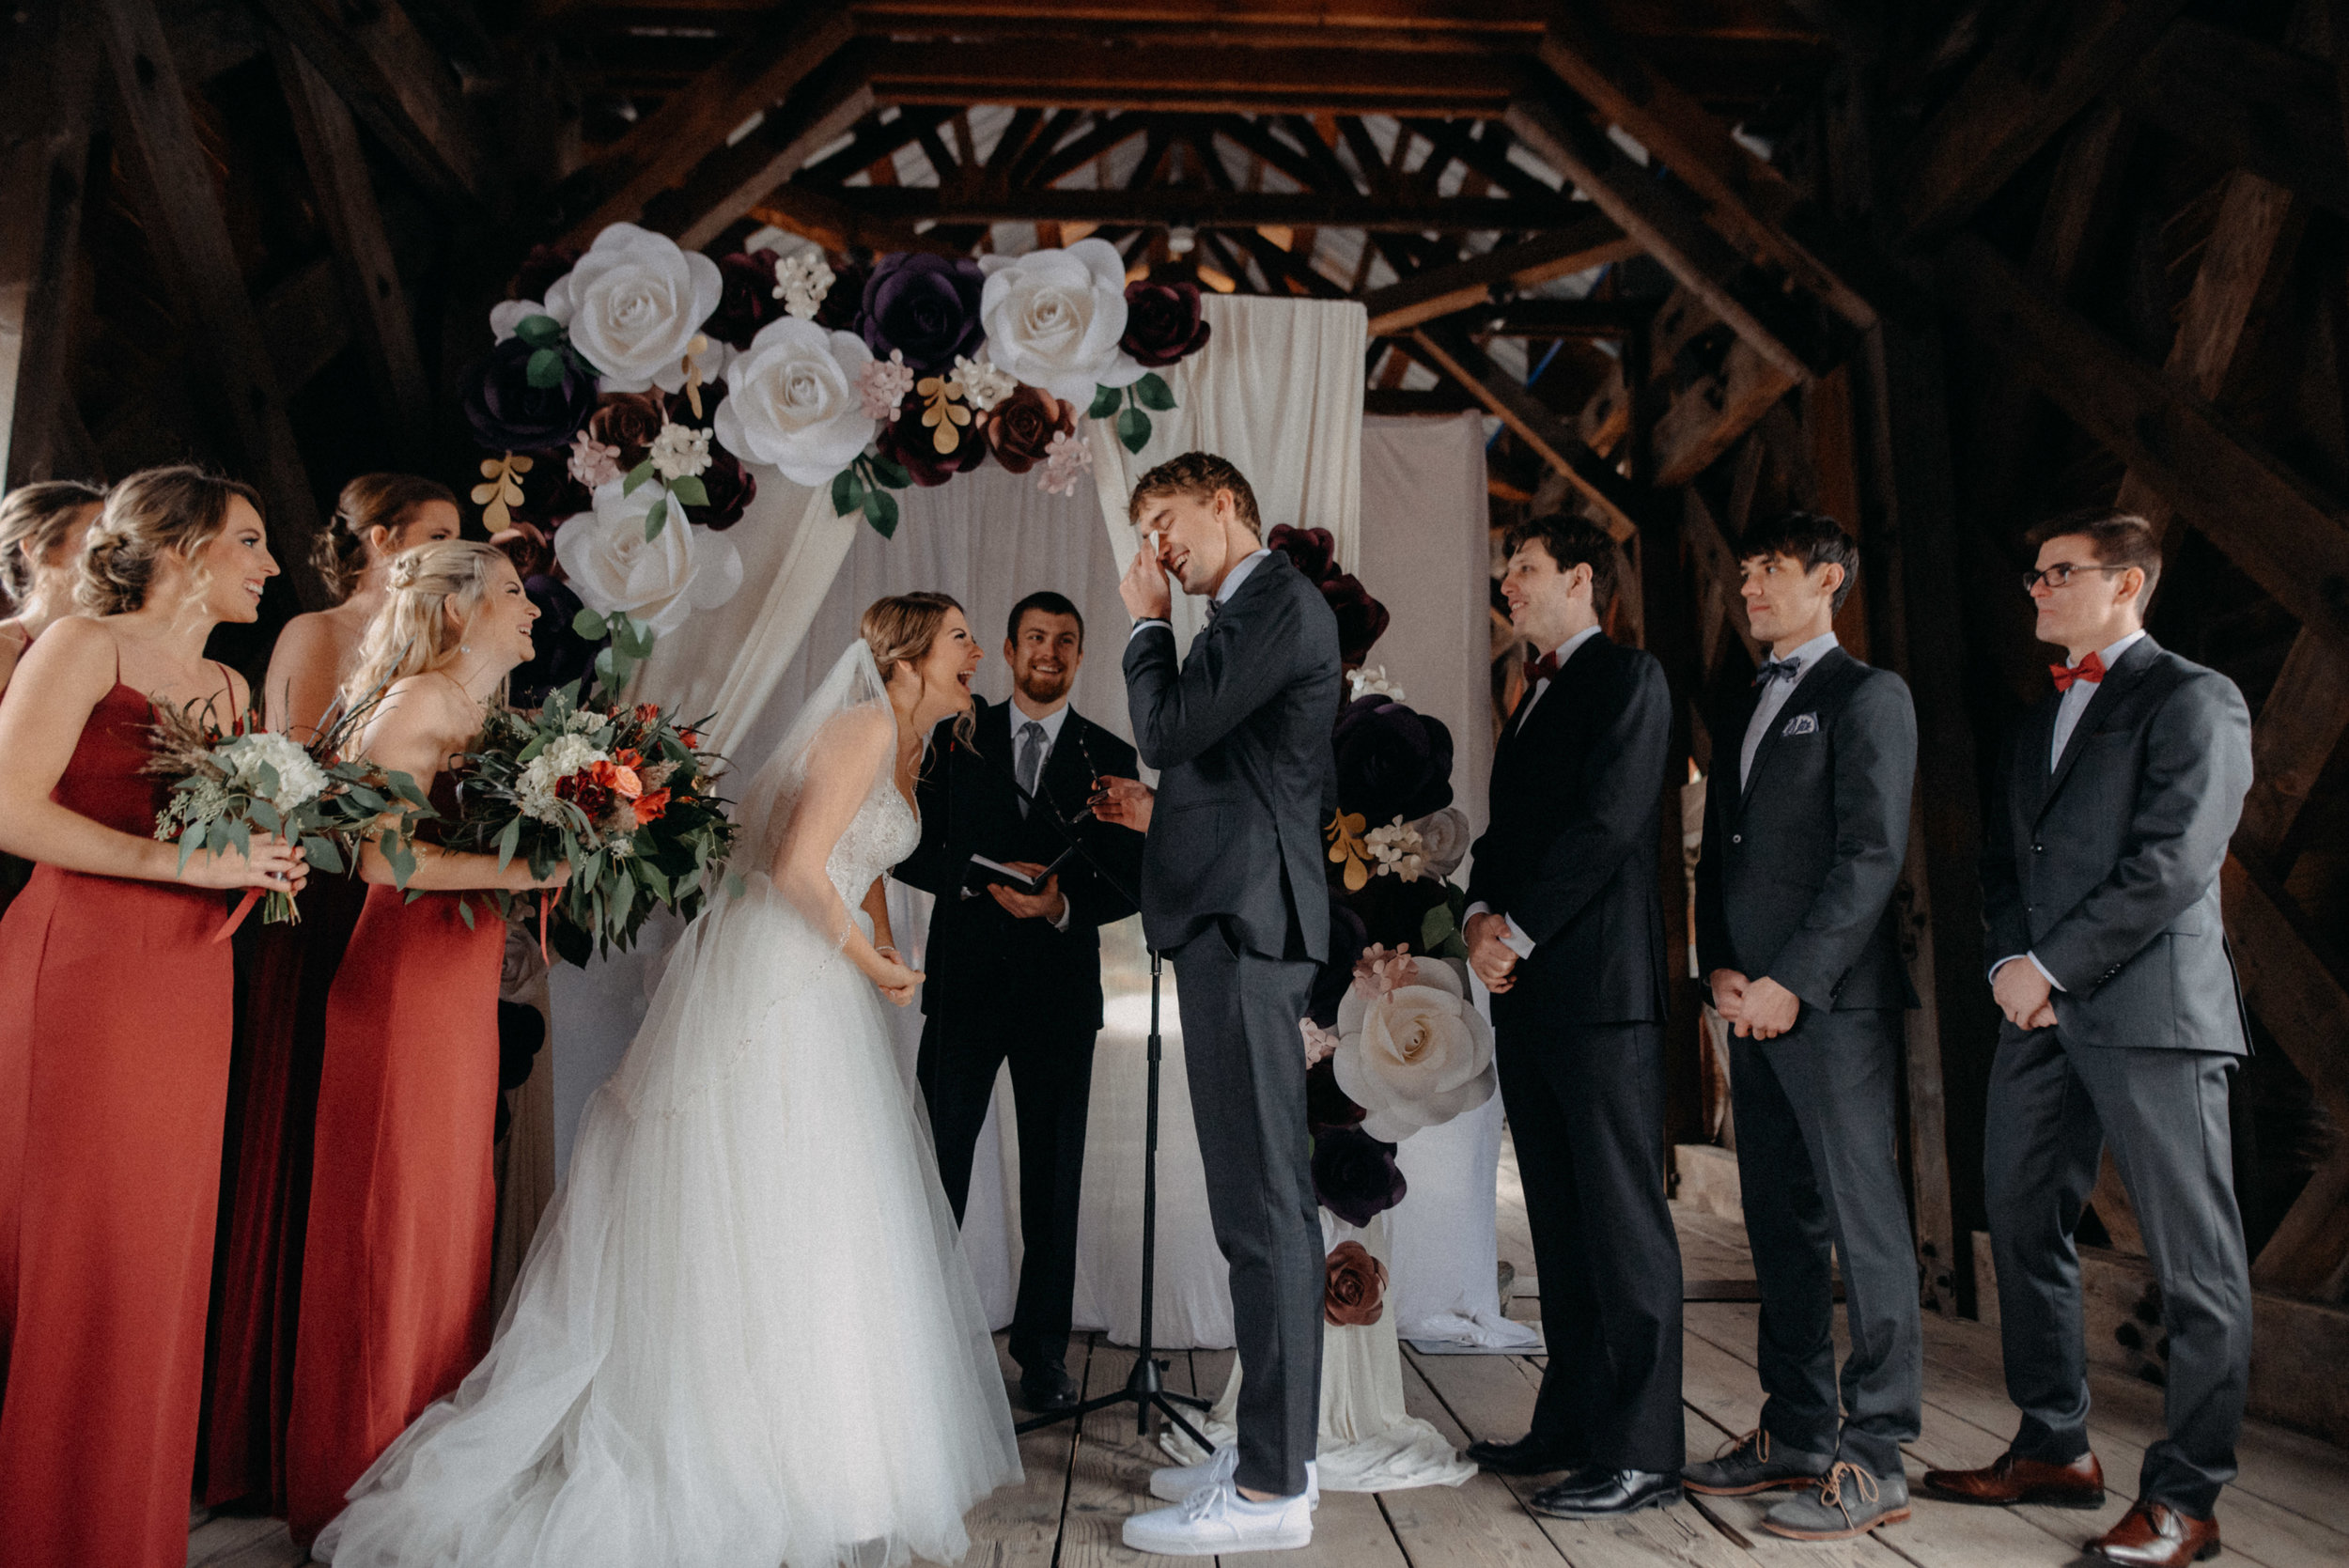 photographe_gatineau_mariage_ottawa_photographer_wedding_natasha_liard_photo_documentary_candid_lifestyle_wakefield_mill_red_bridge (32).jpg